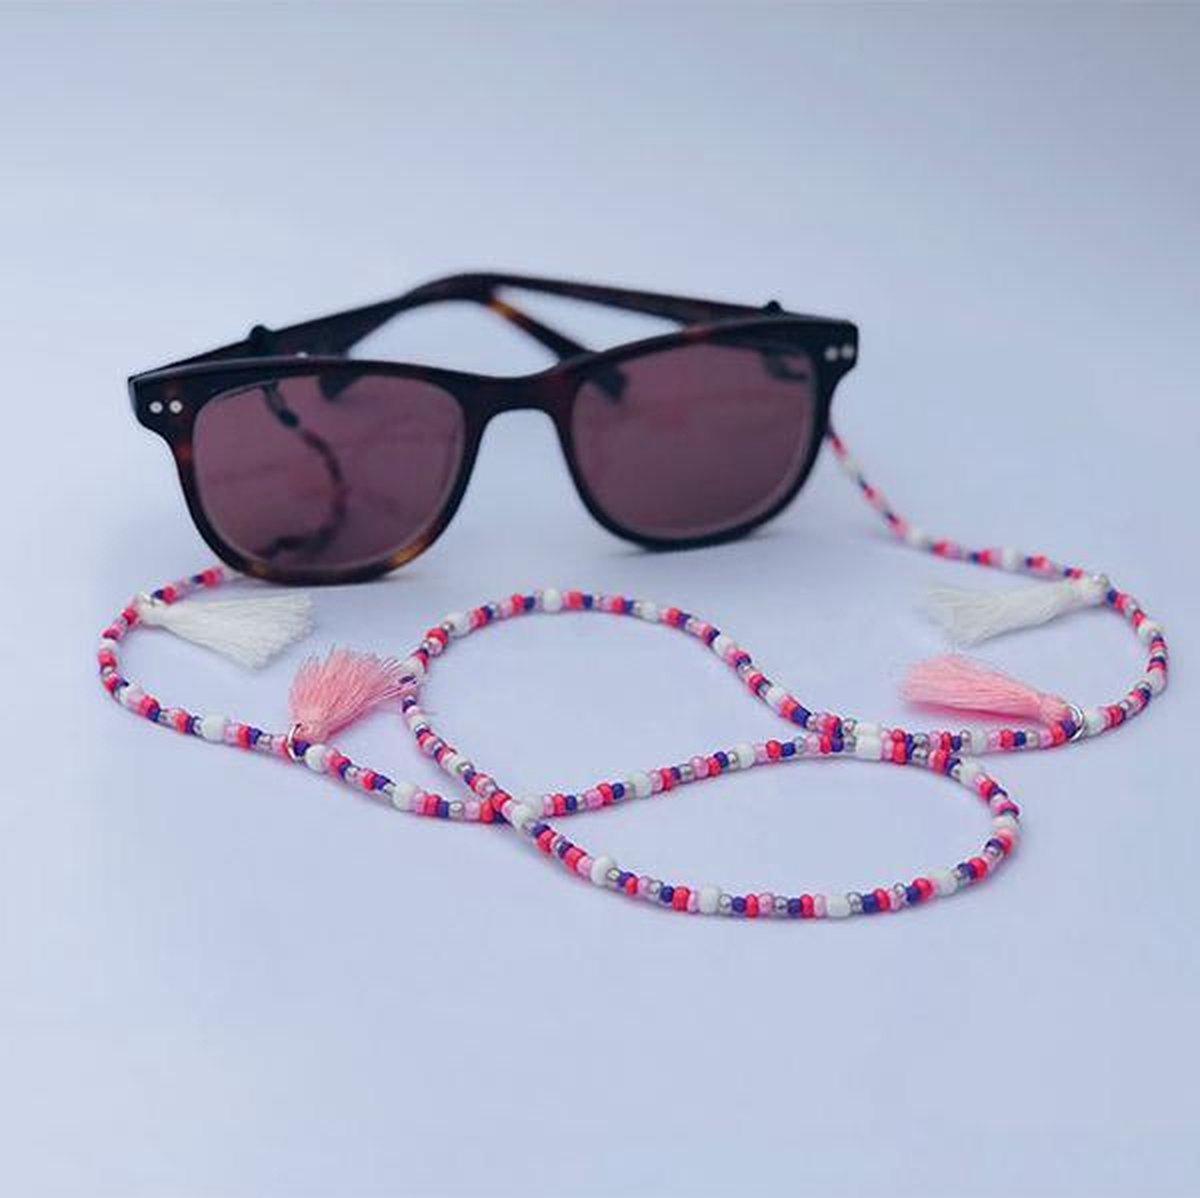 Zonnebril koord - Roze met kwastjes - Musthaves by Fleur